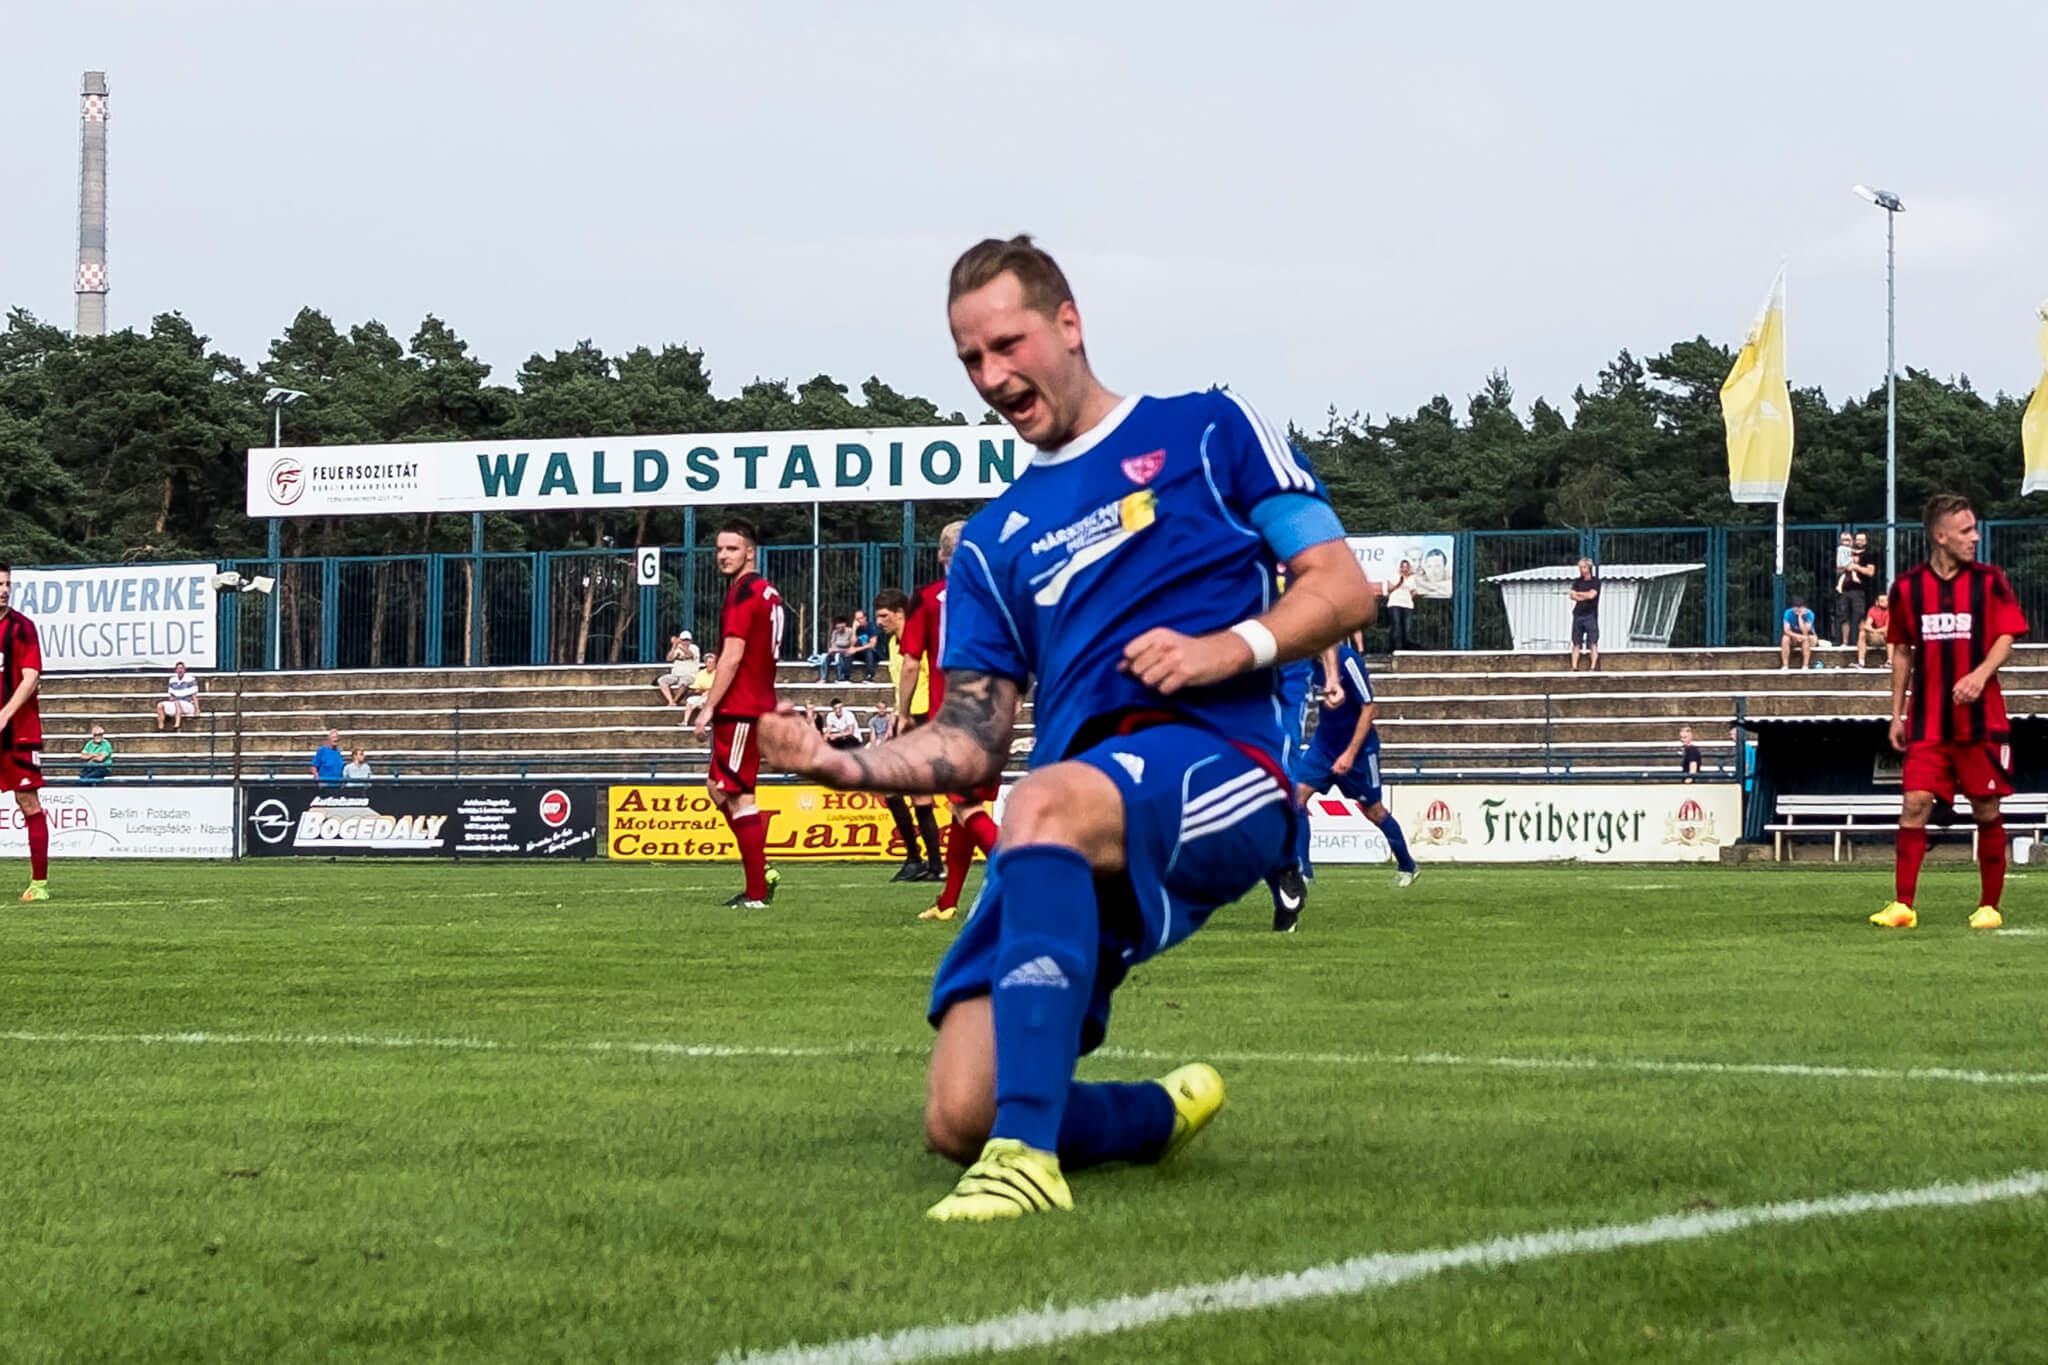 26.8.2017 - Brandenburgliga - Ludwigsfelder FC - RSV Waltersdorf 1909